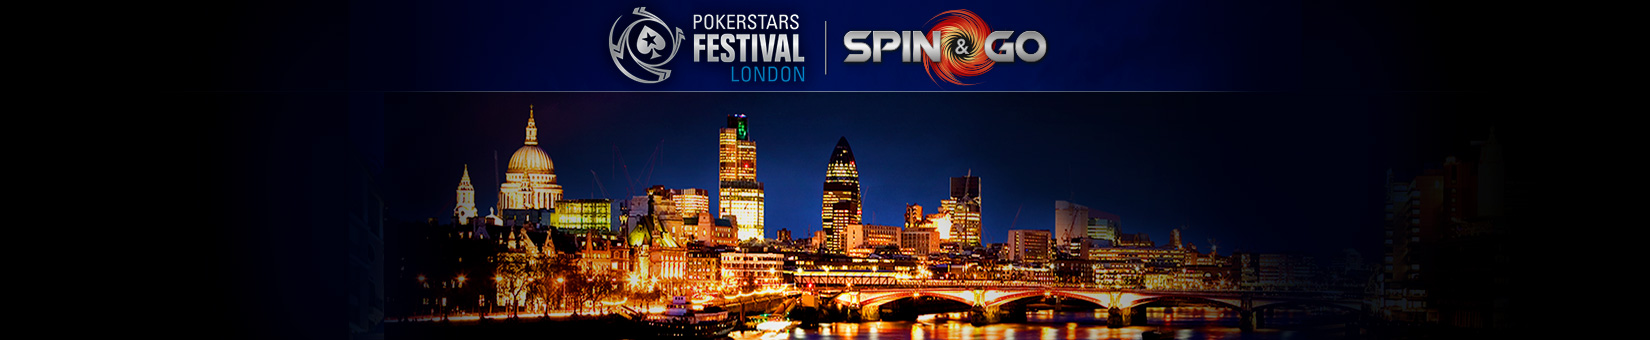 PokerStars Festival London – Spin & Go Qualifiers